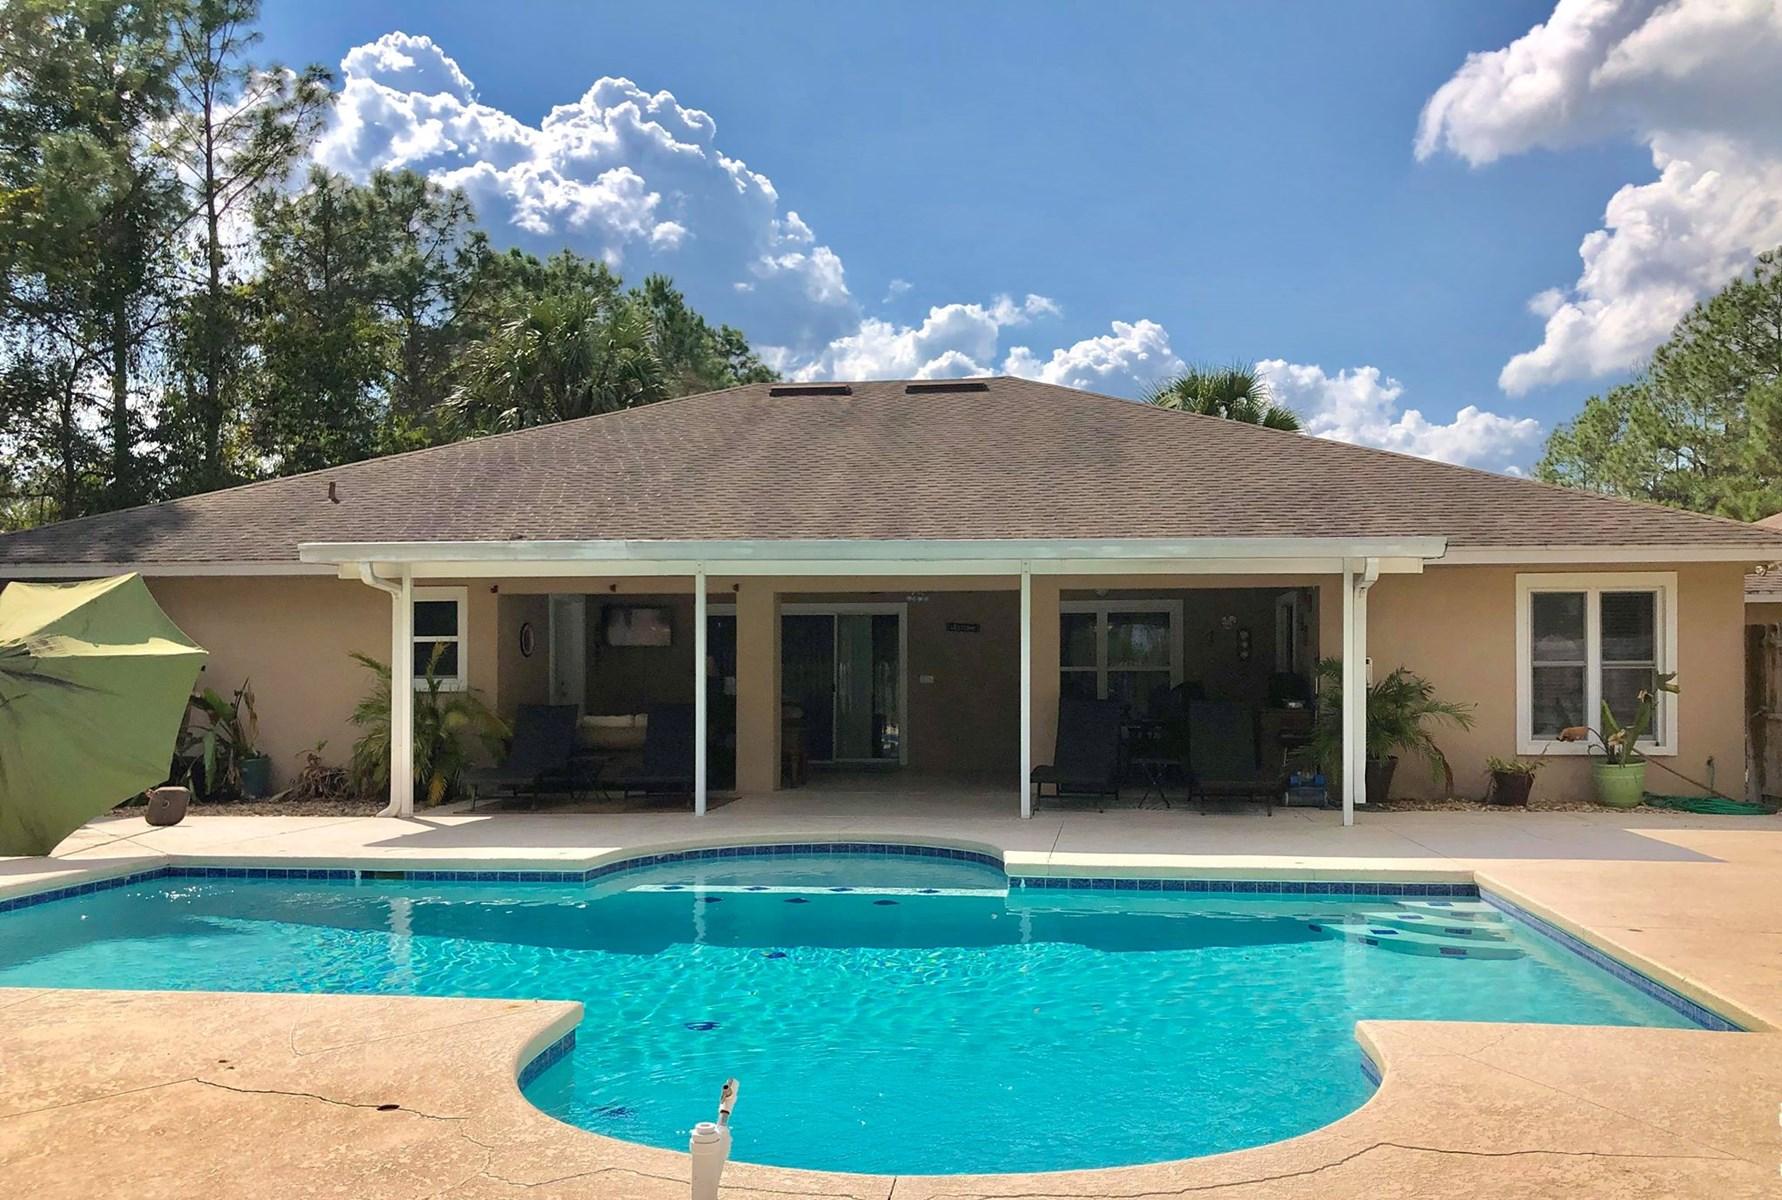 5br 4ba 2 865 Sq Split Plan Home W Pool On 2 Acres